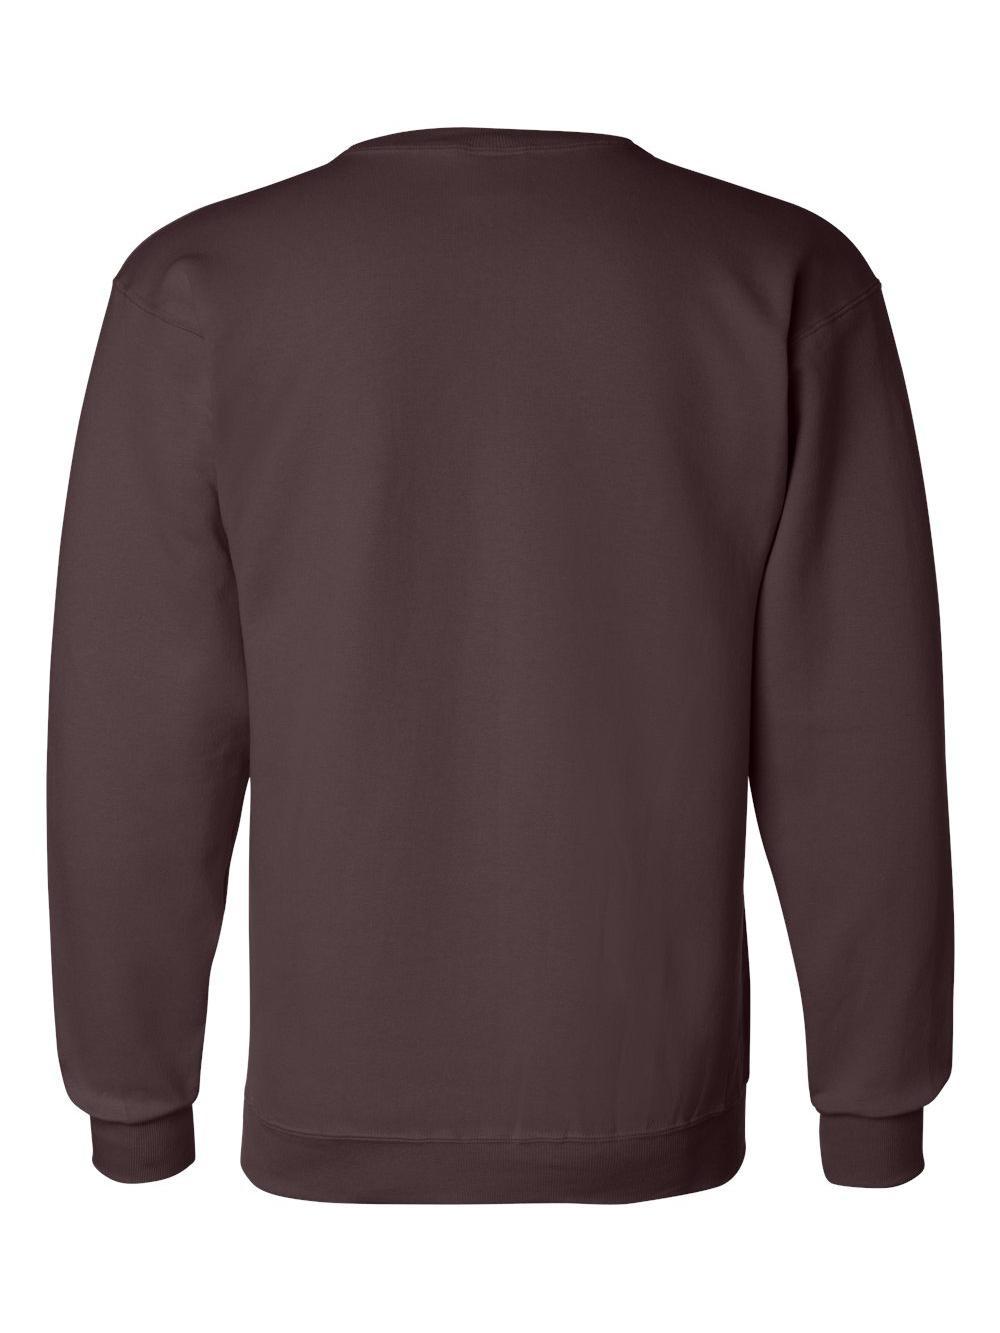 Champion-Double-Dry-Eco-Crewneck-Sweatshirt-S600 thumbnail 13